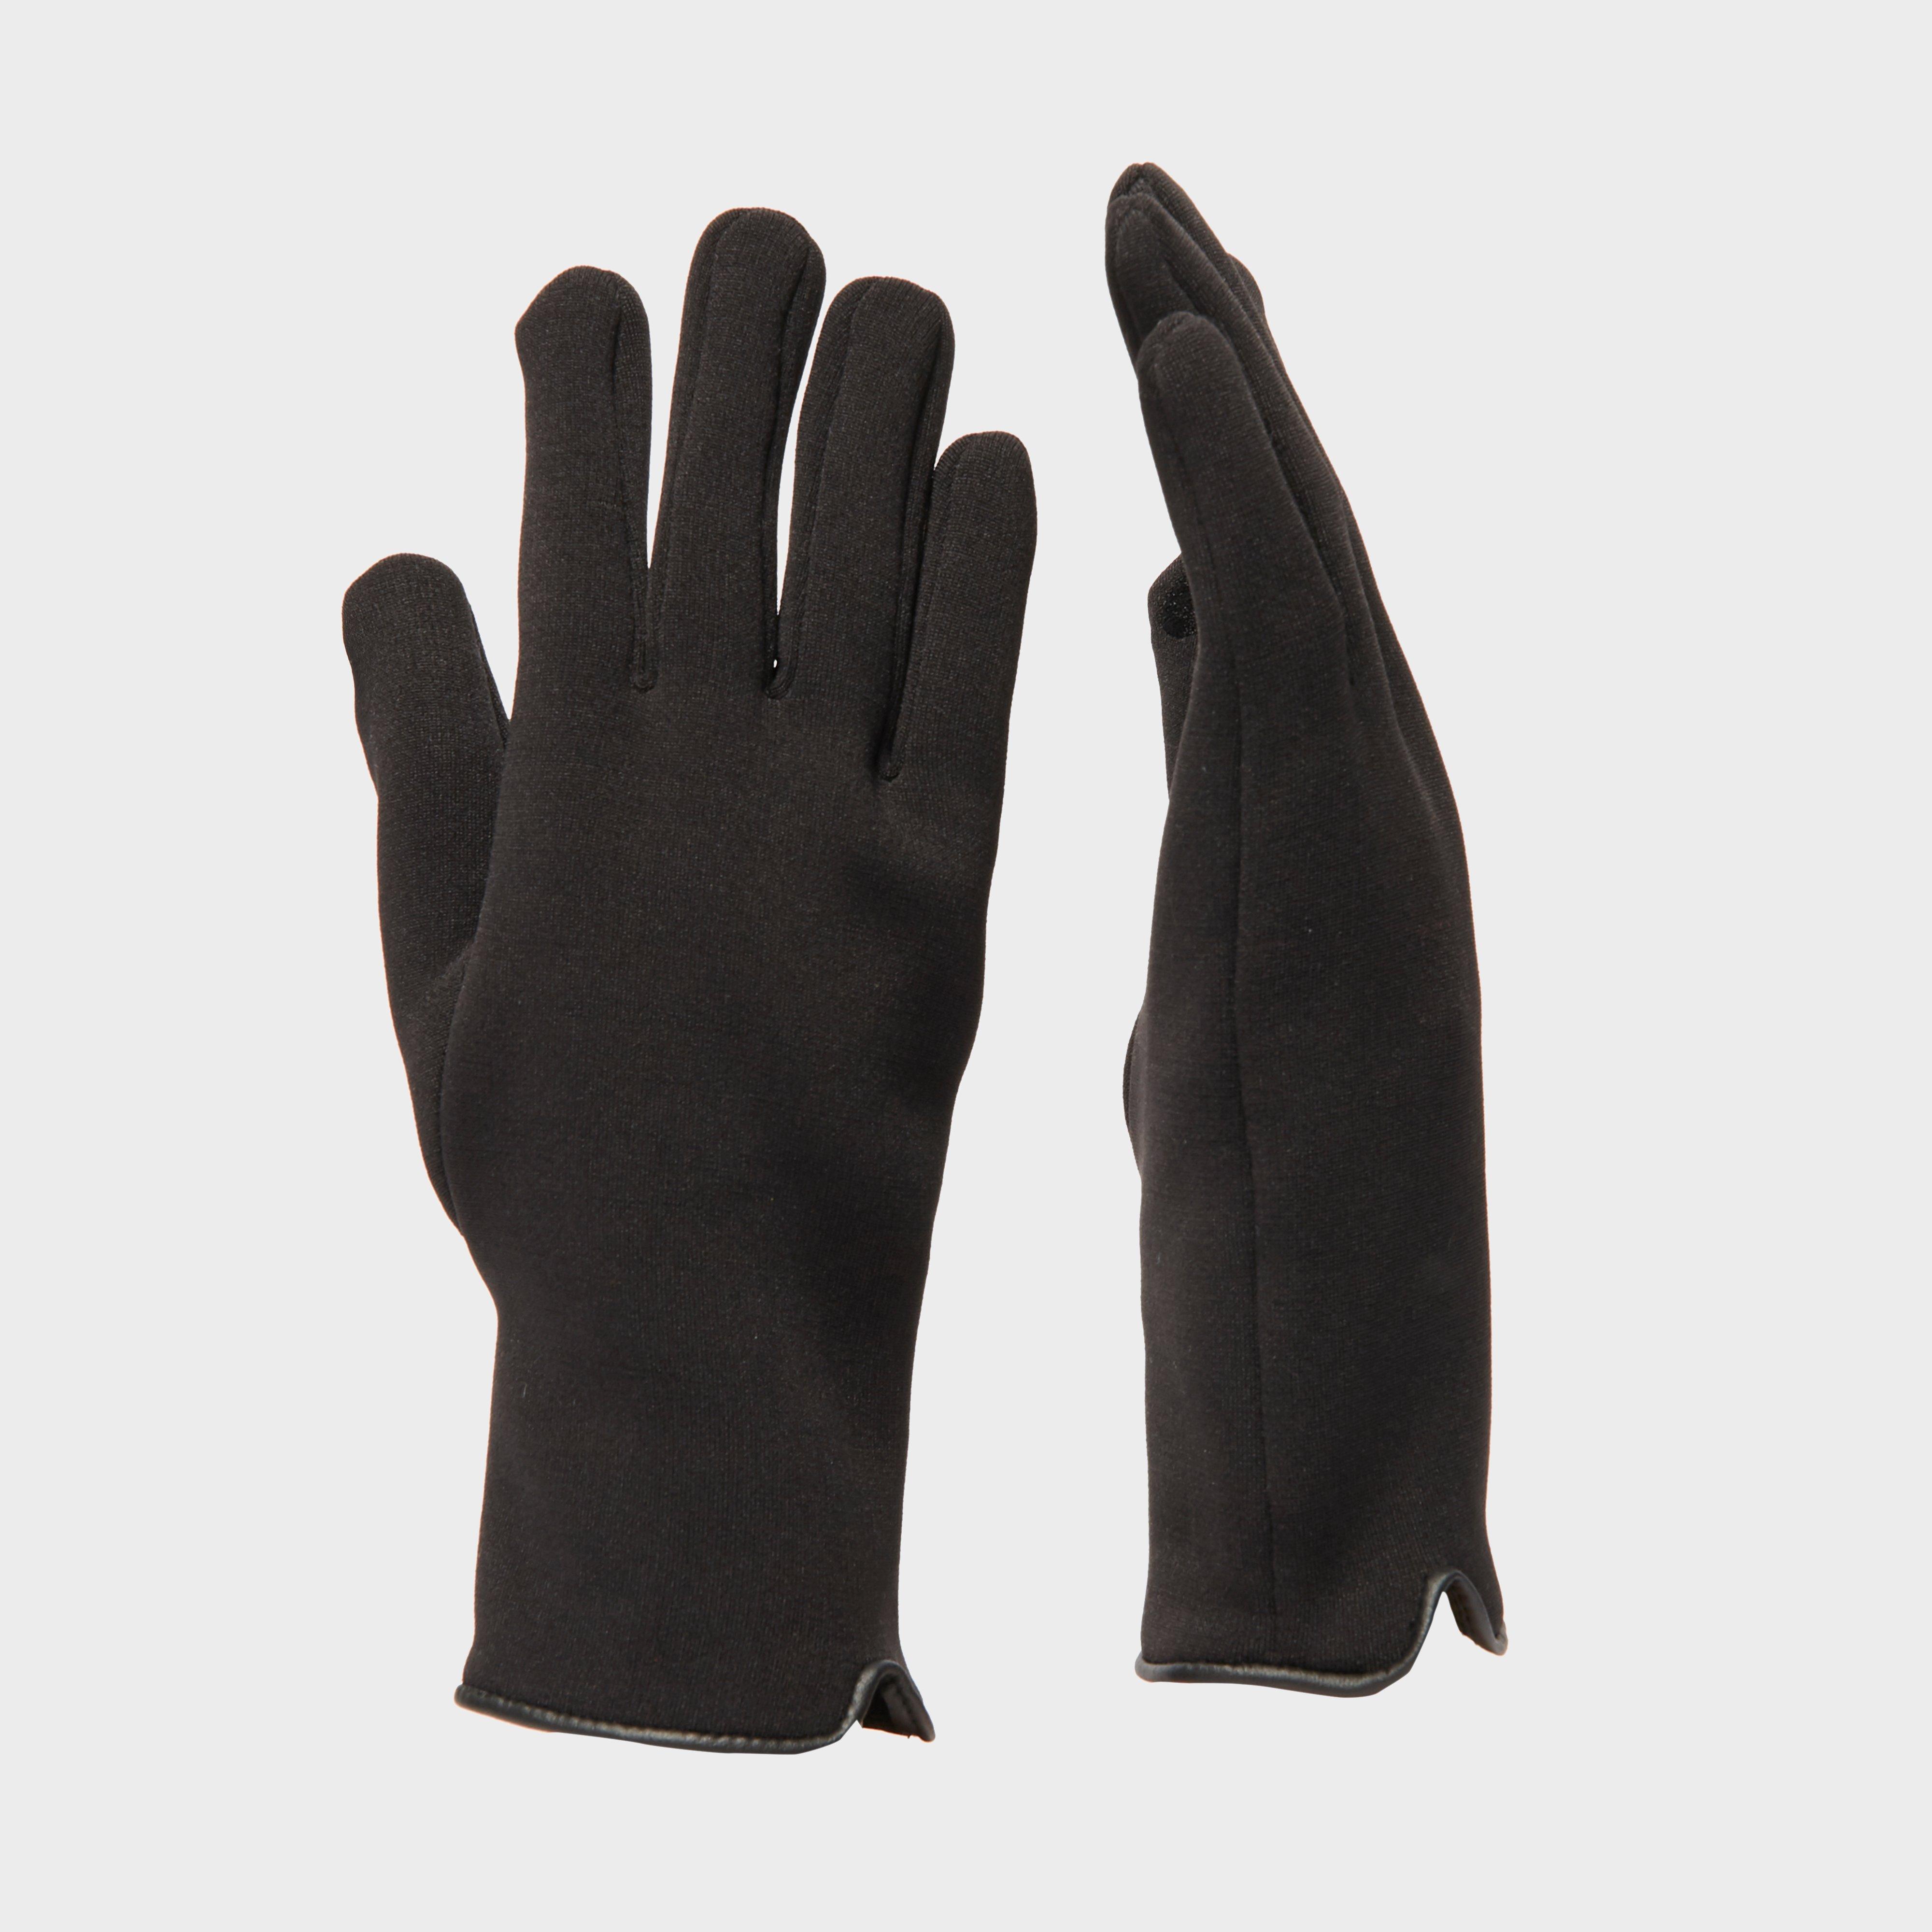 Technicals Water Resistant Chest Wallet  Black